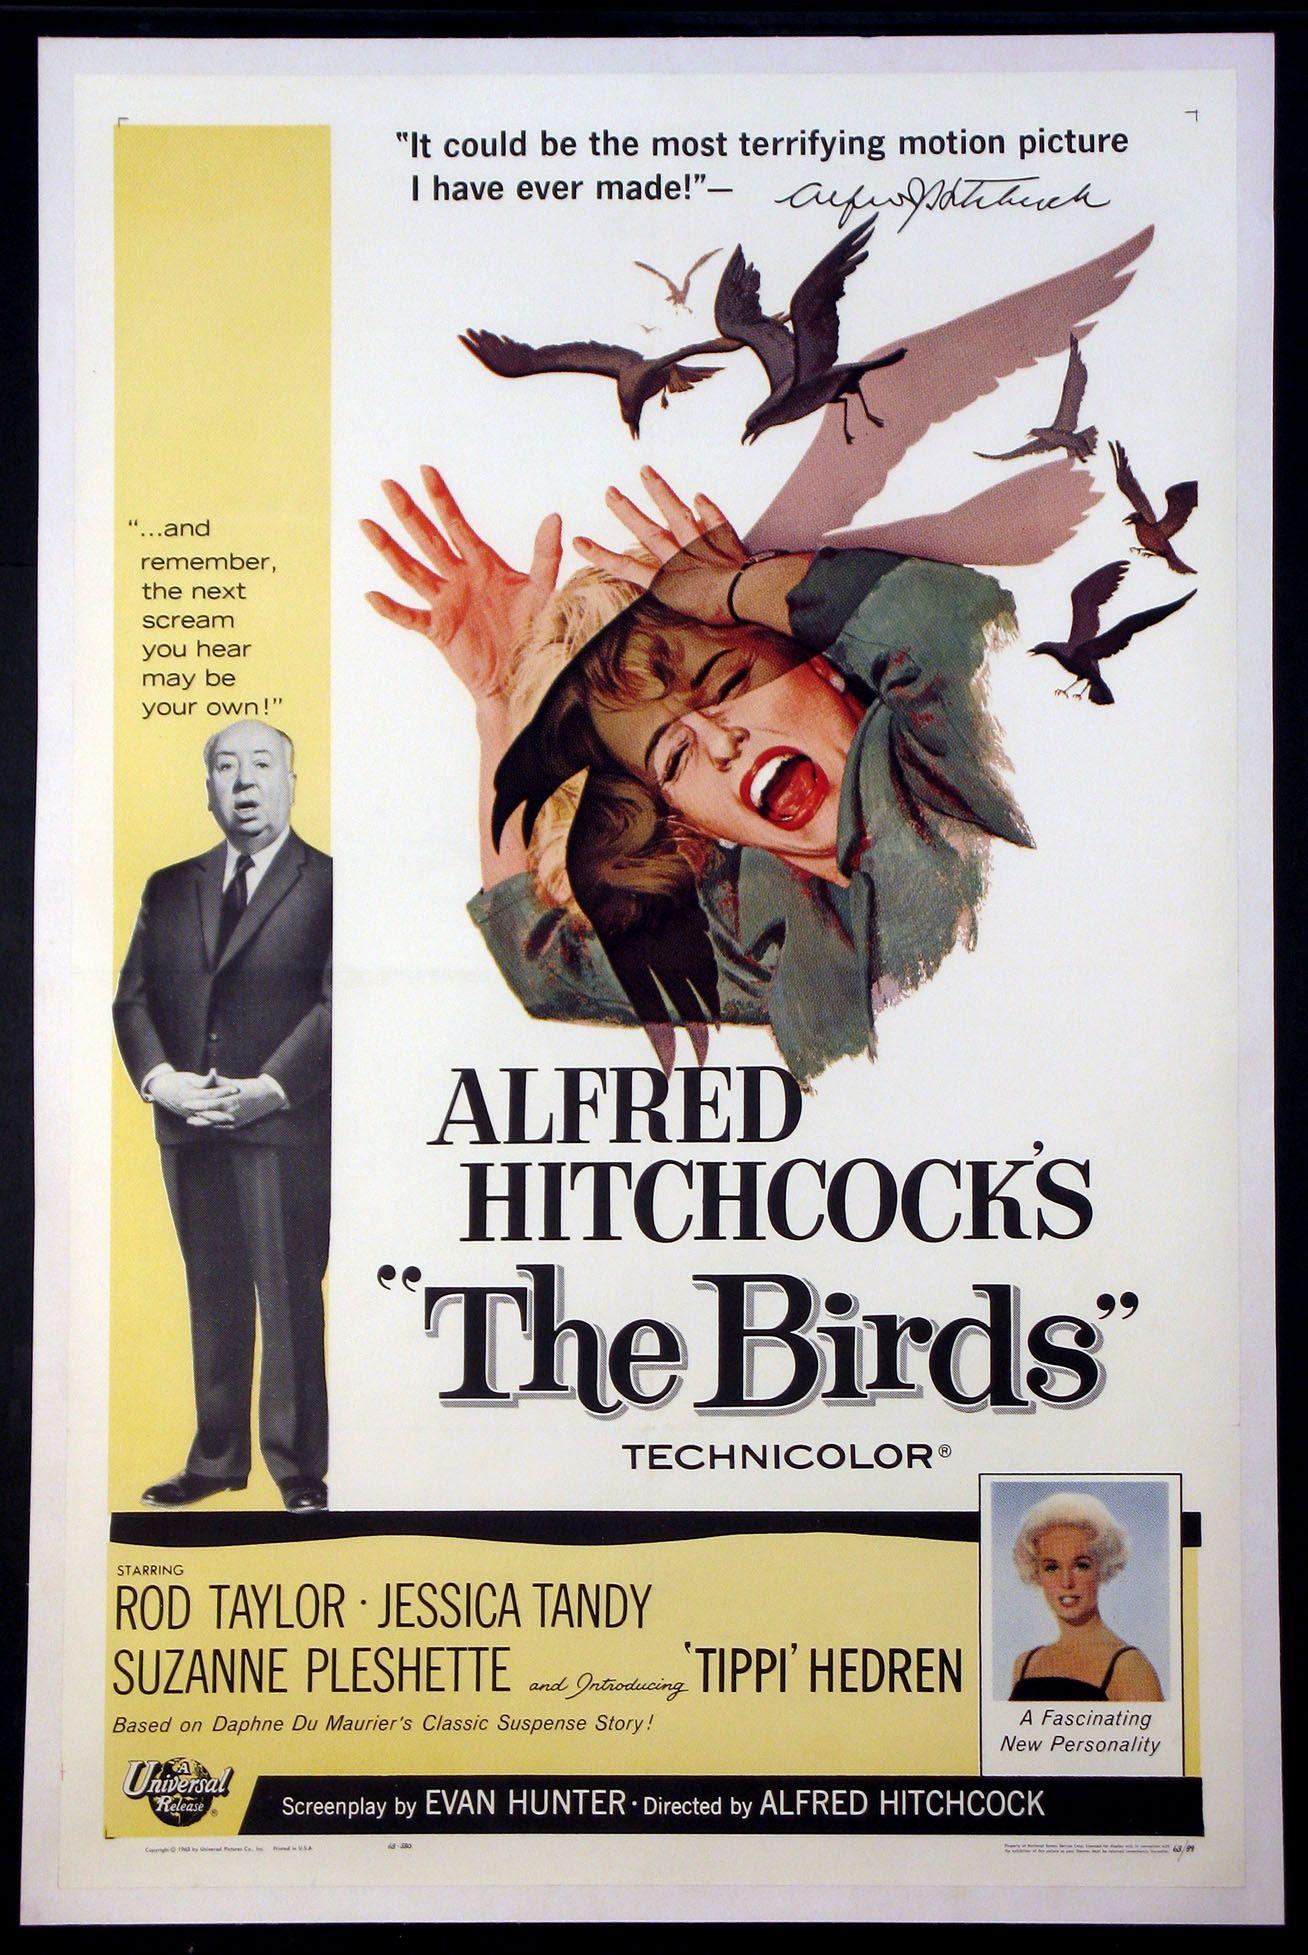 The Birds 1963 Original One Sheet Size 27x41 Movie Poster The Birds Movie Horror Movie Posters Alfred Hitchcock Movies